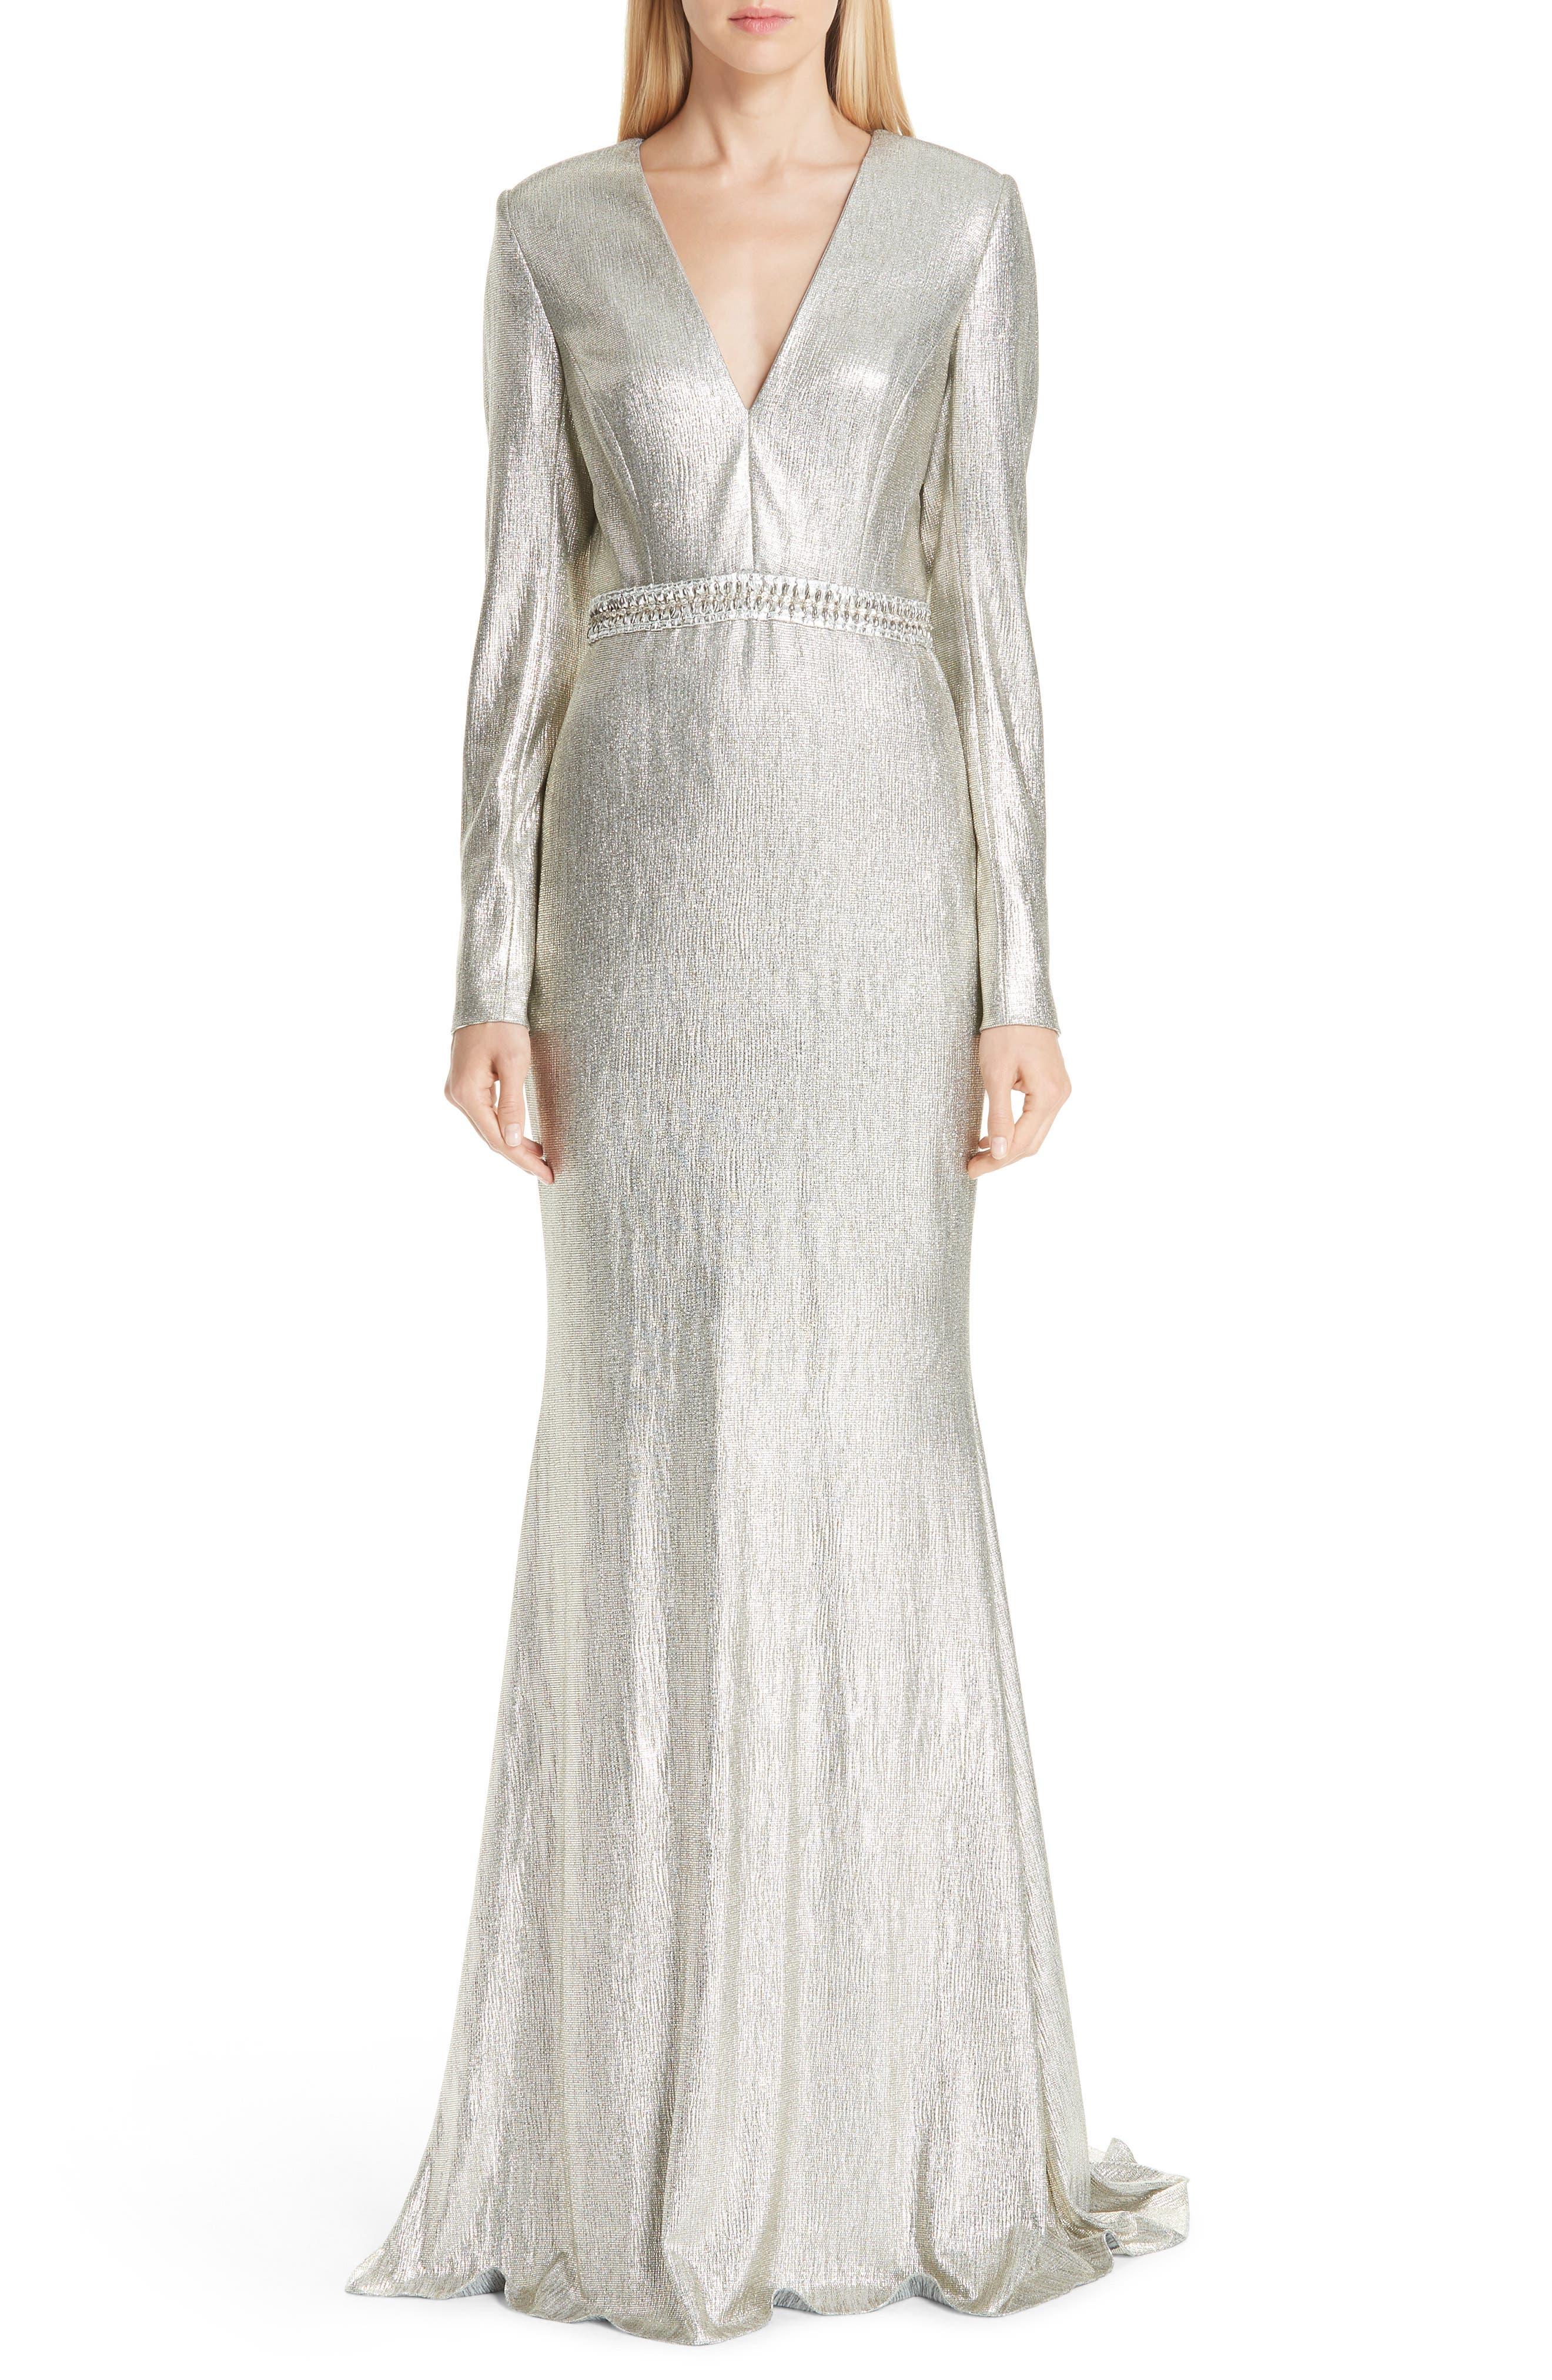 Badgley Mischka Collection Beaded Waist Metallic Gown, Metallic